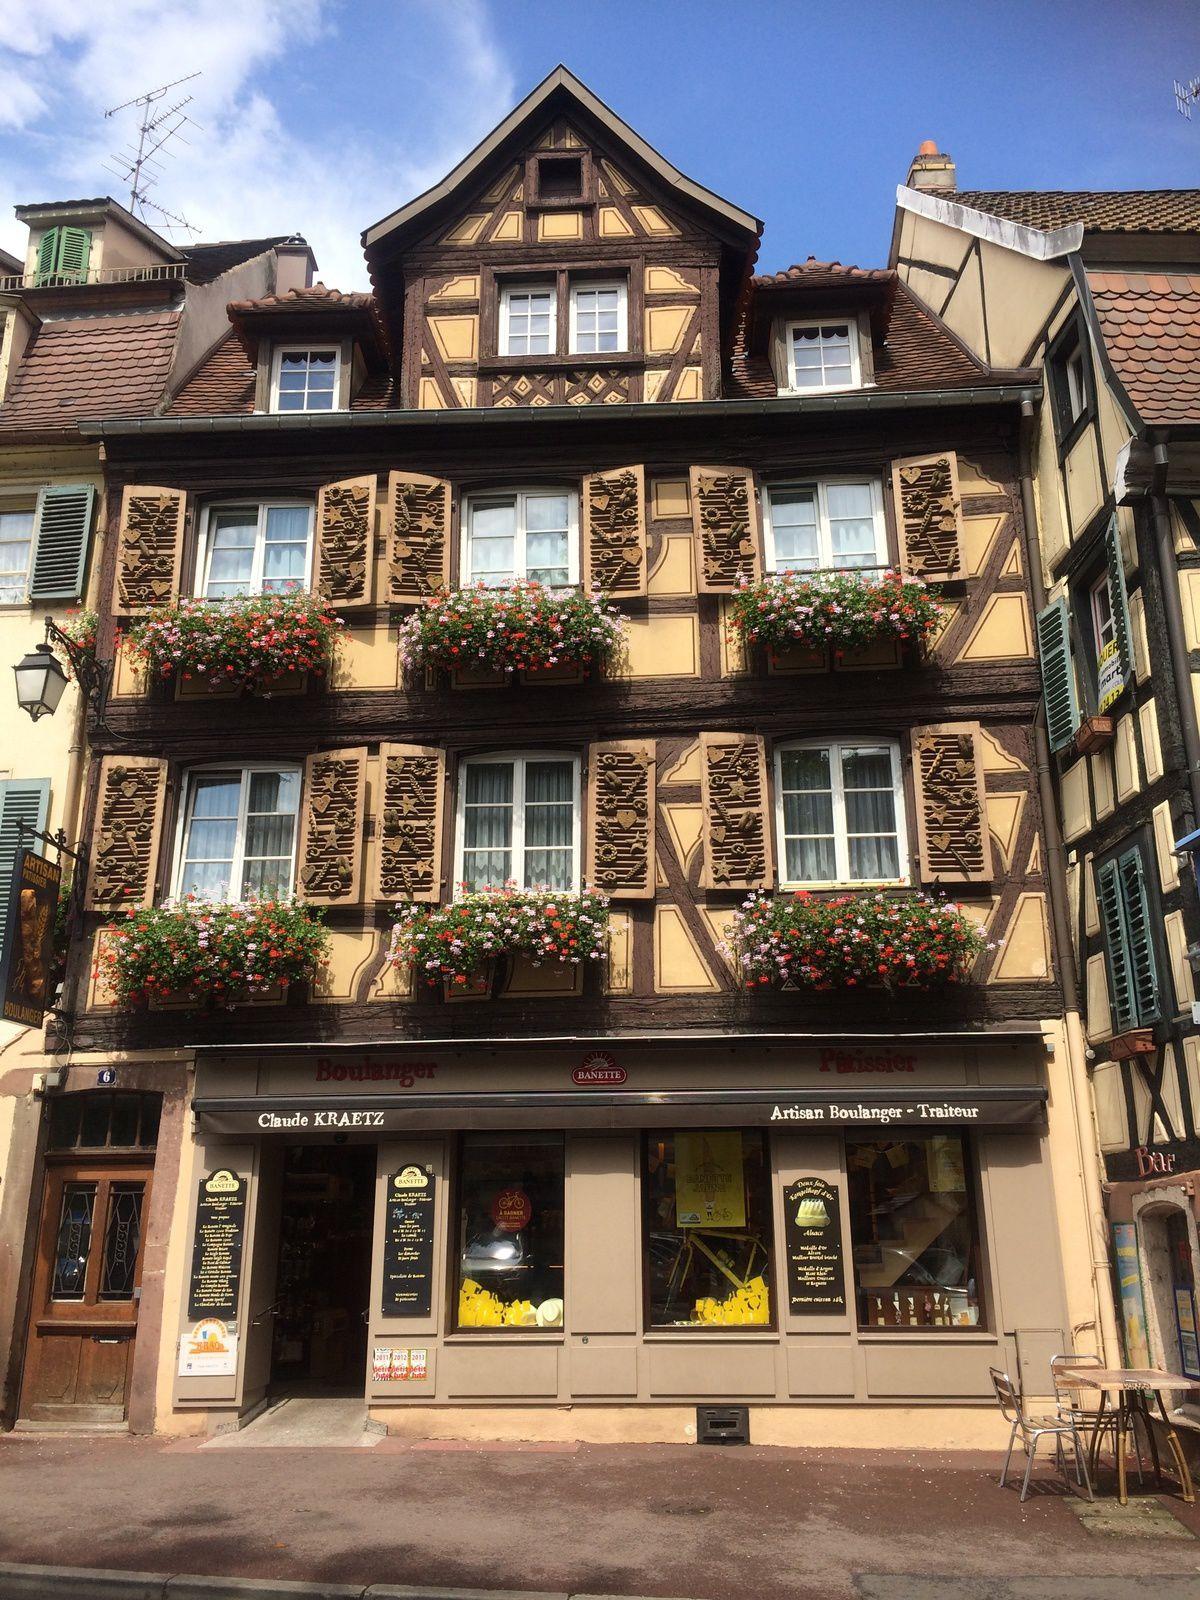 De jolies façades de la ville